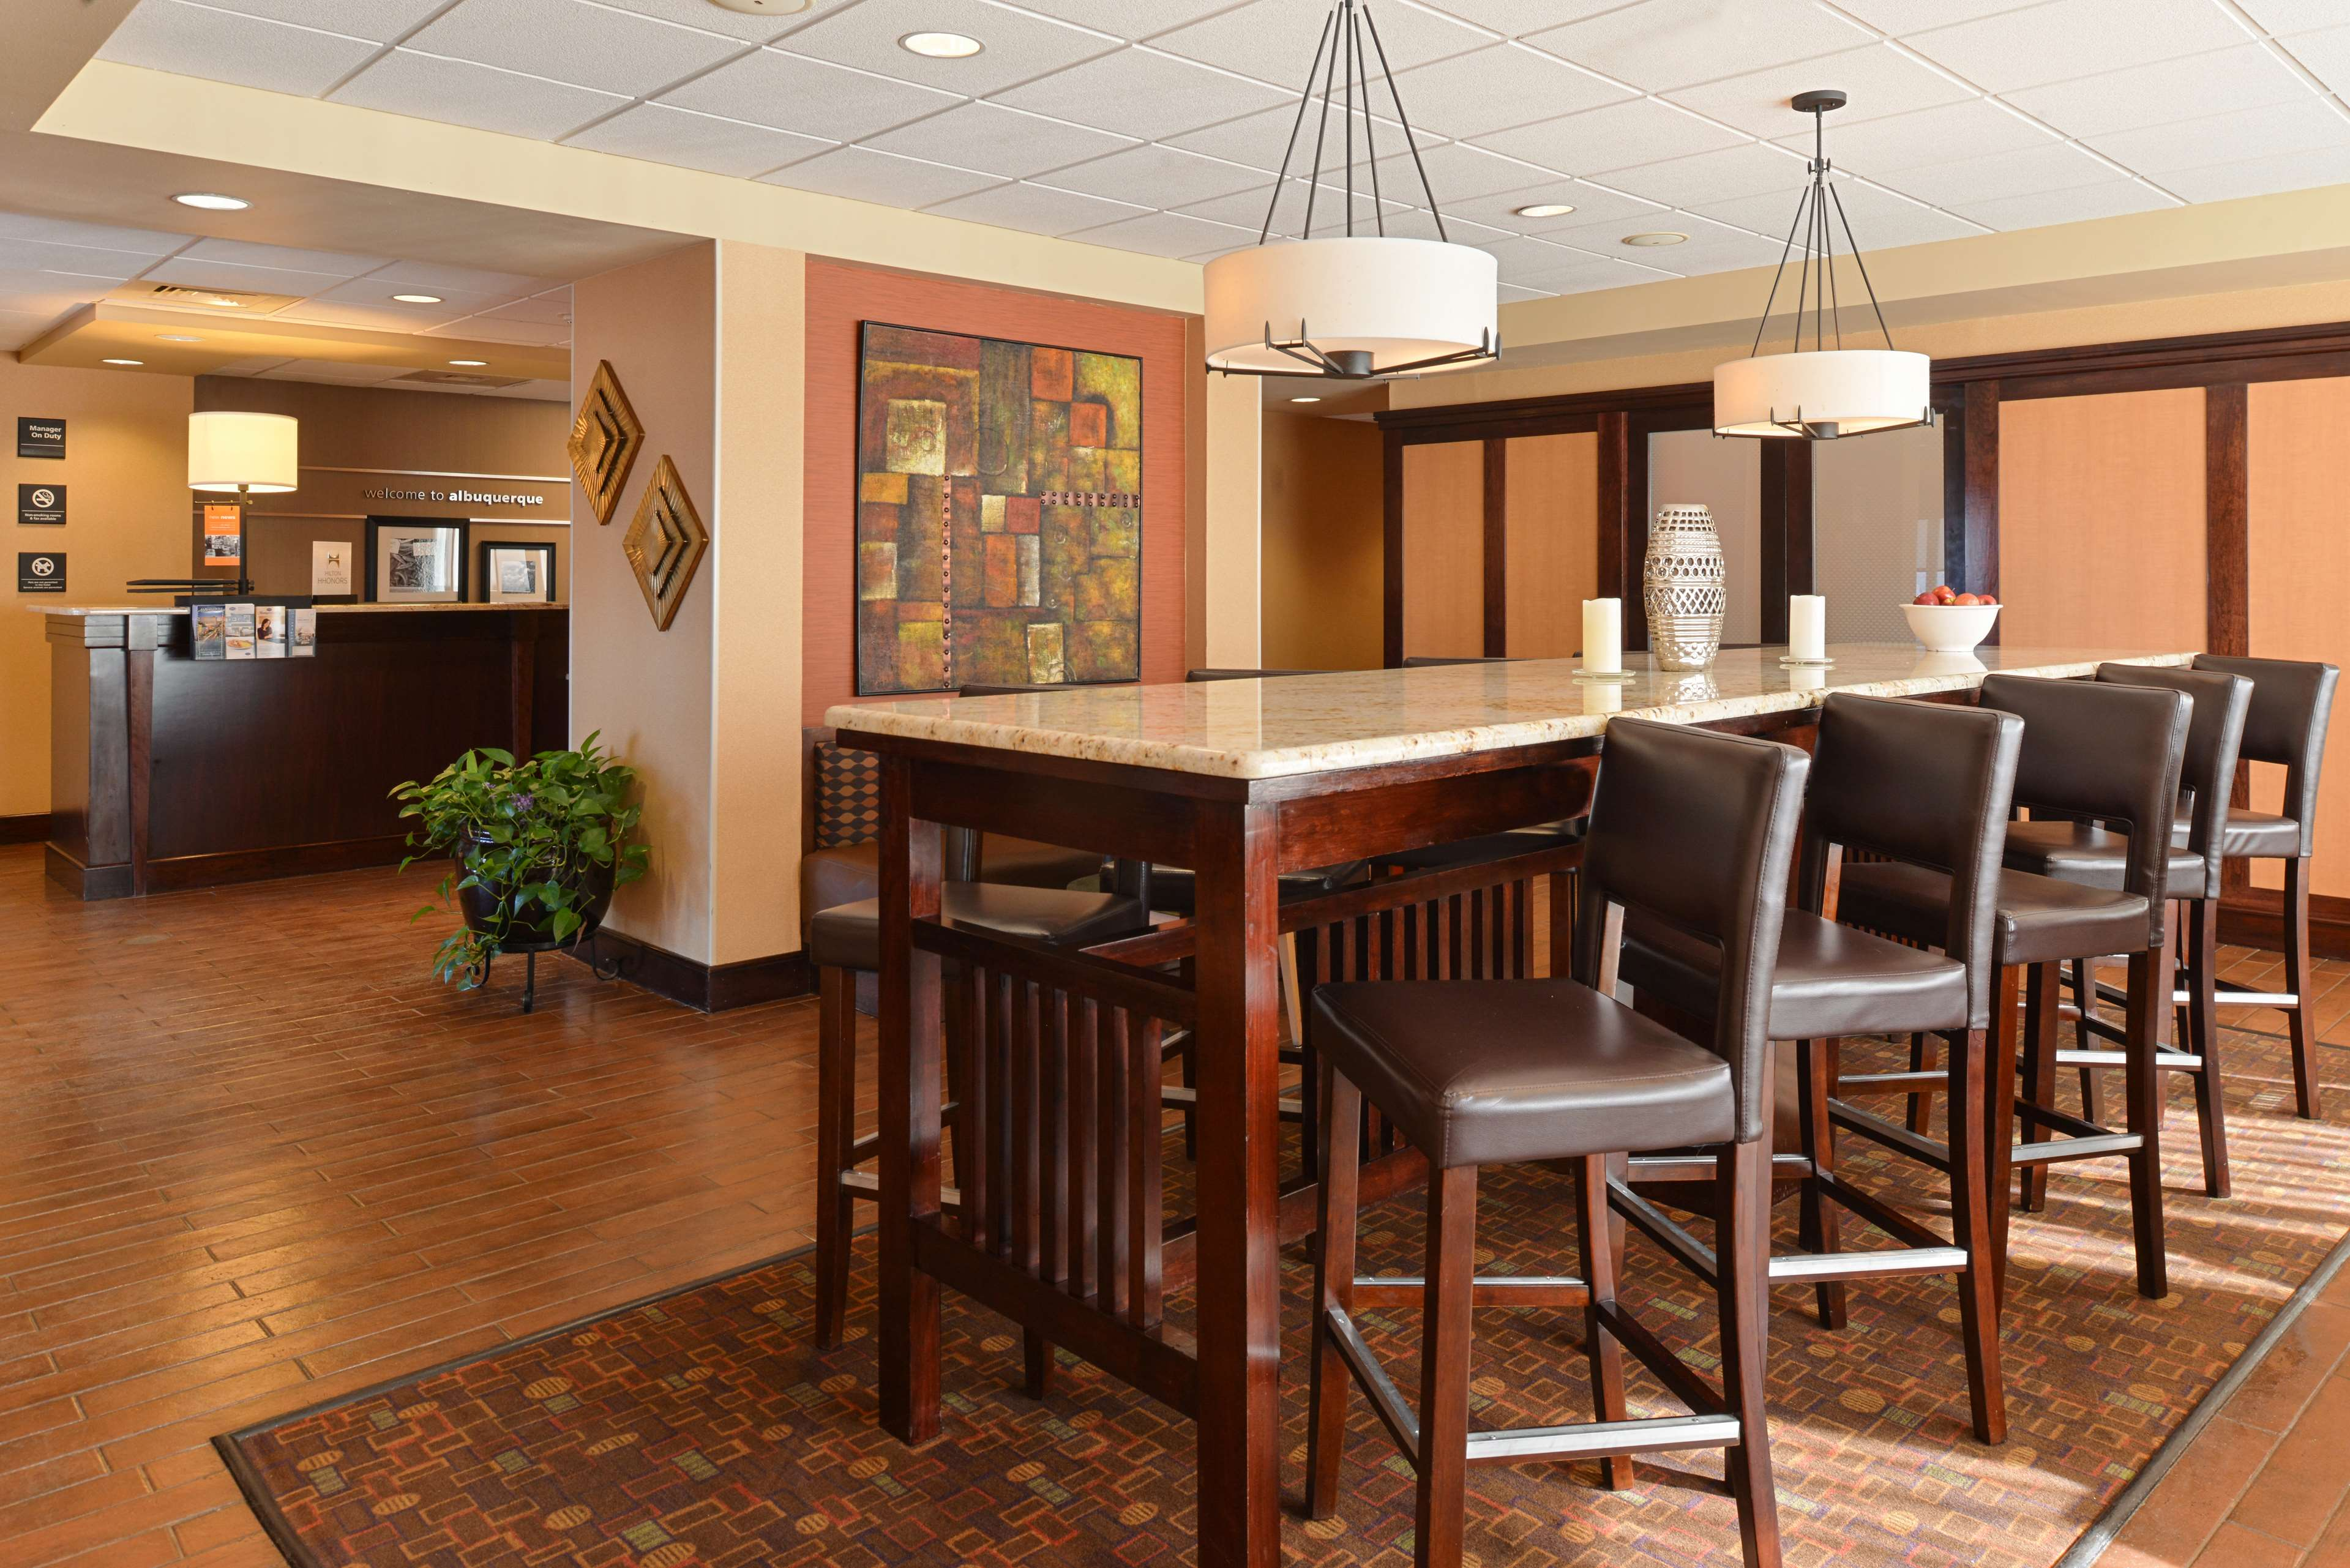 Hampton Inn Albuquerque-University/Midtown image 14